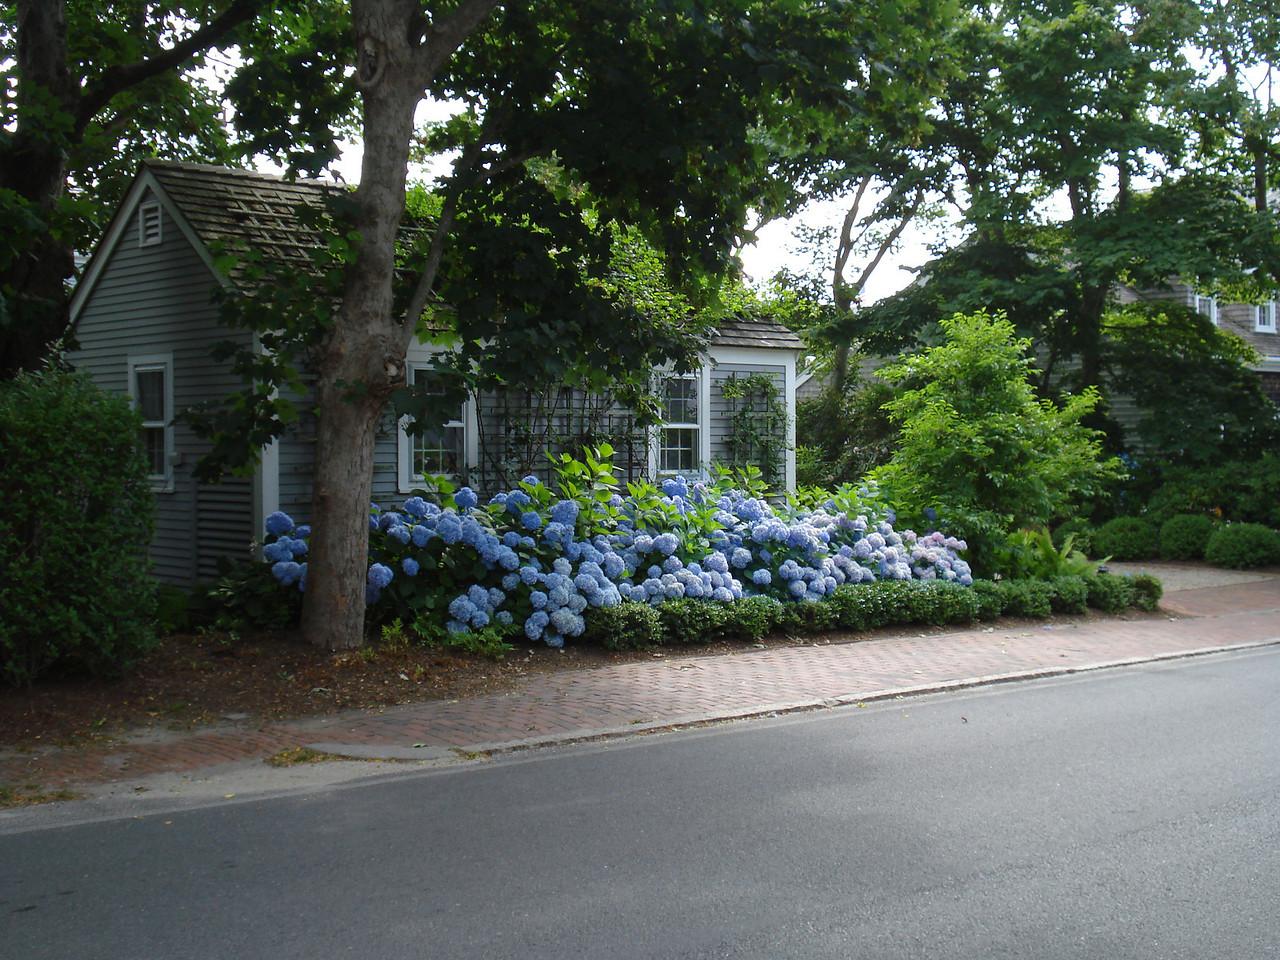 Nantucket Blue™ Hydrangea http://www.gardendebut.com/nantucket-blue-hydrangea.php